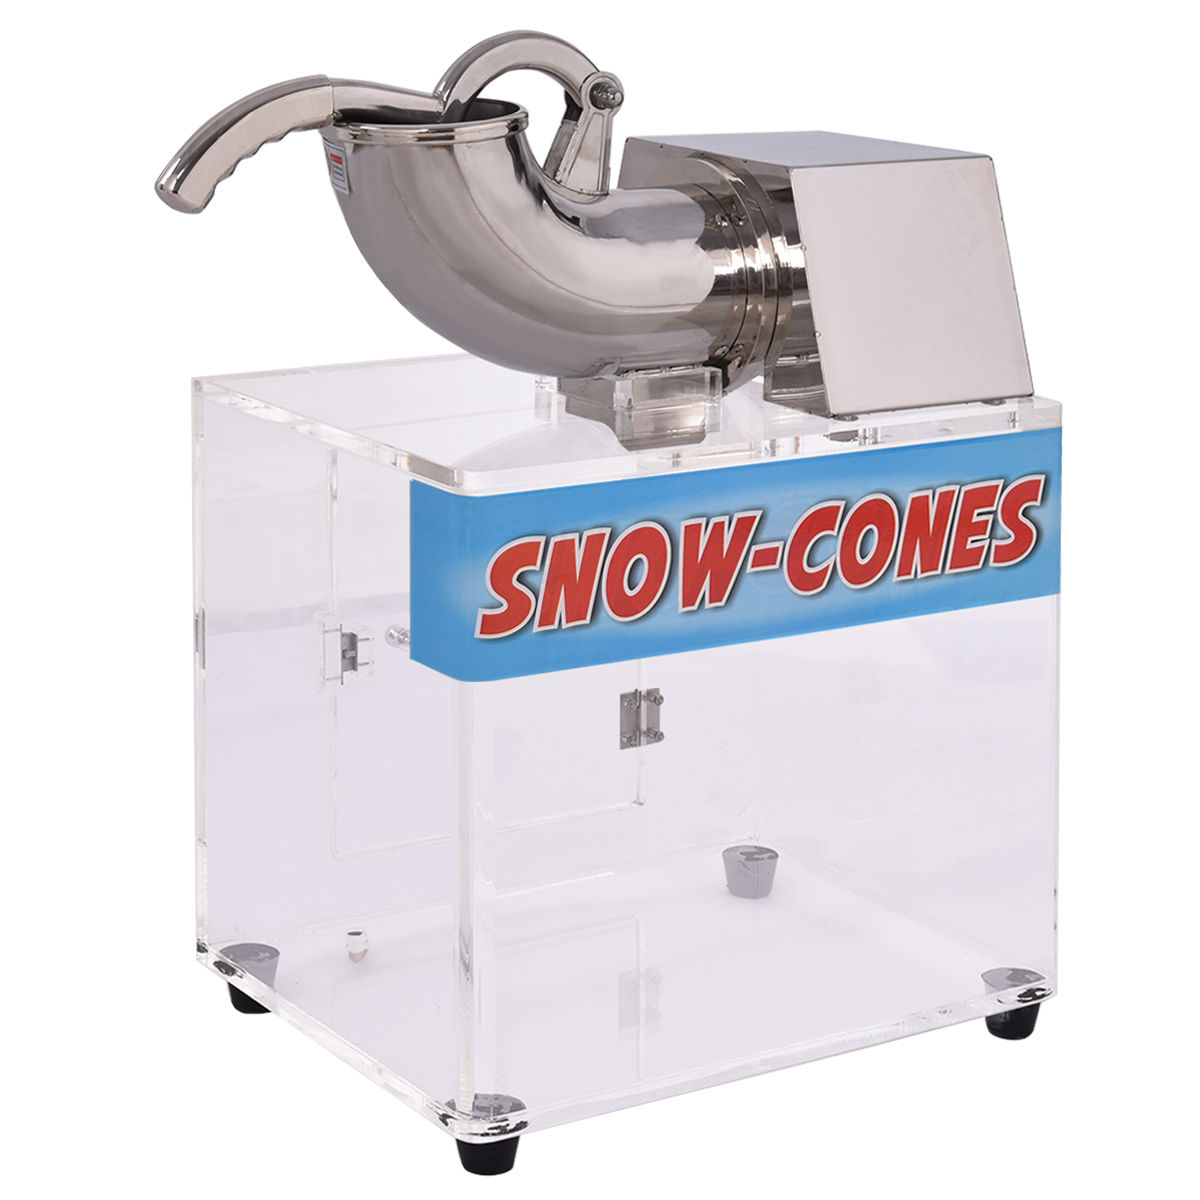 Costway Electric Snow Cone Machine Ice Shaver Maker Shavi...